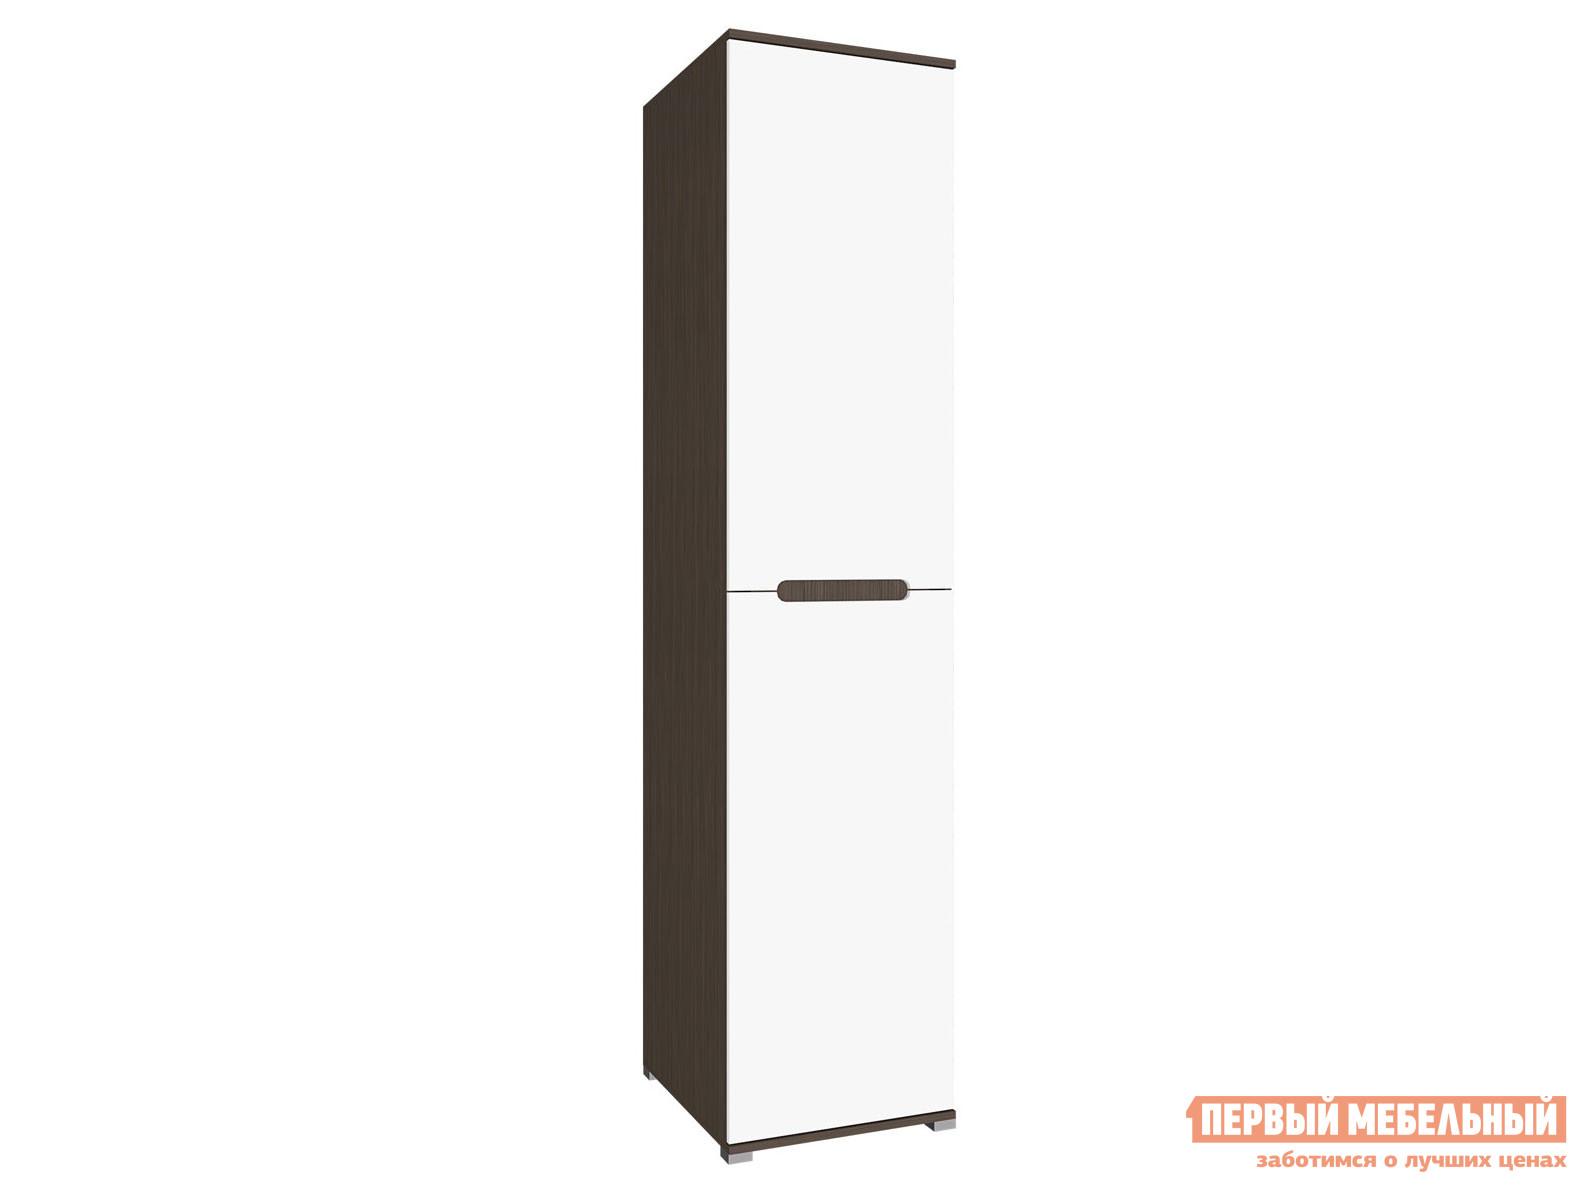 Распашной шкаф  Шкаф Вегас Венге / Белый глянец — Шкаф Вегас Венге / Белый глянец